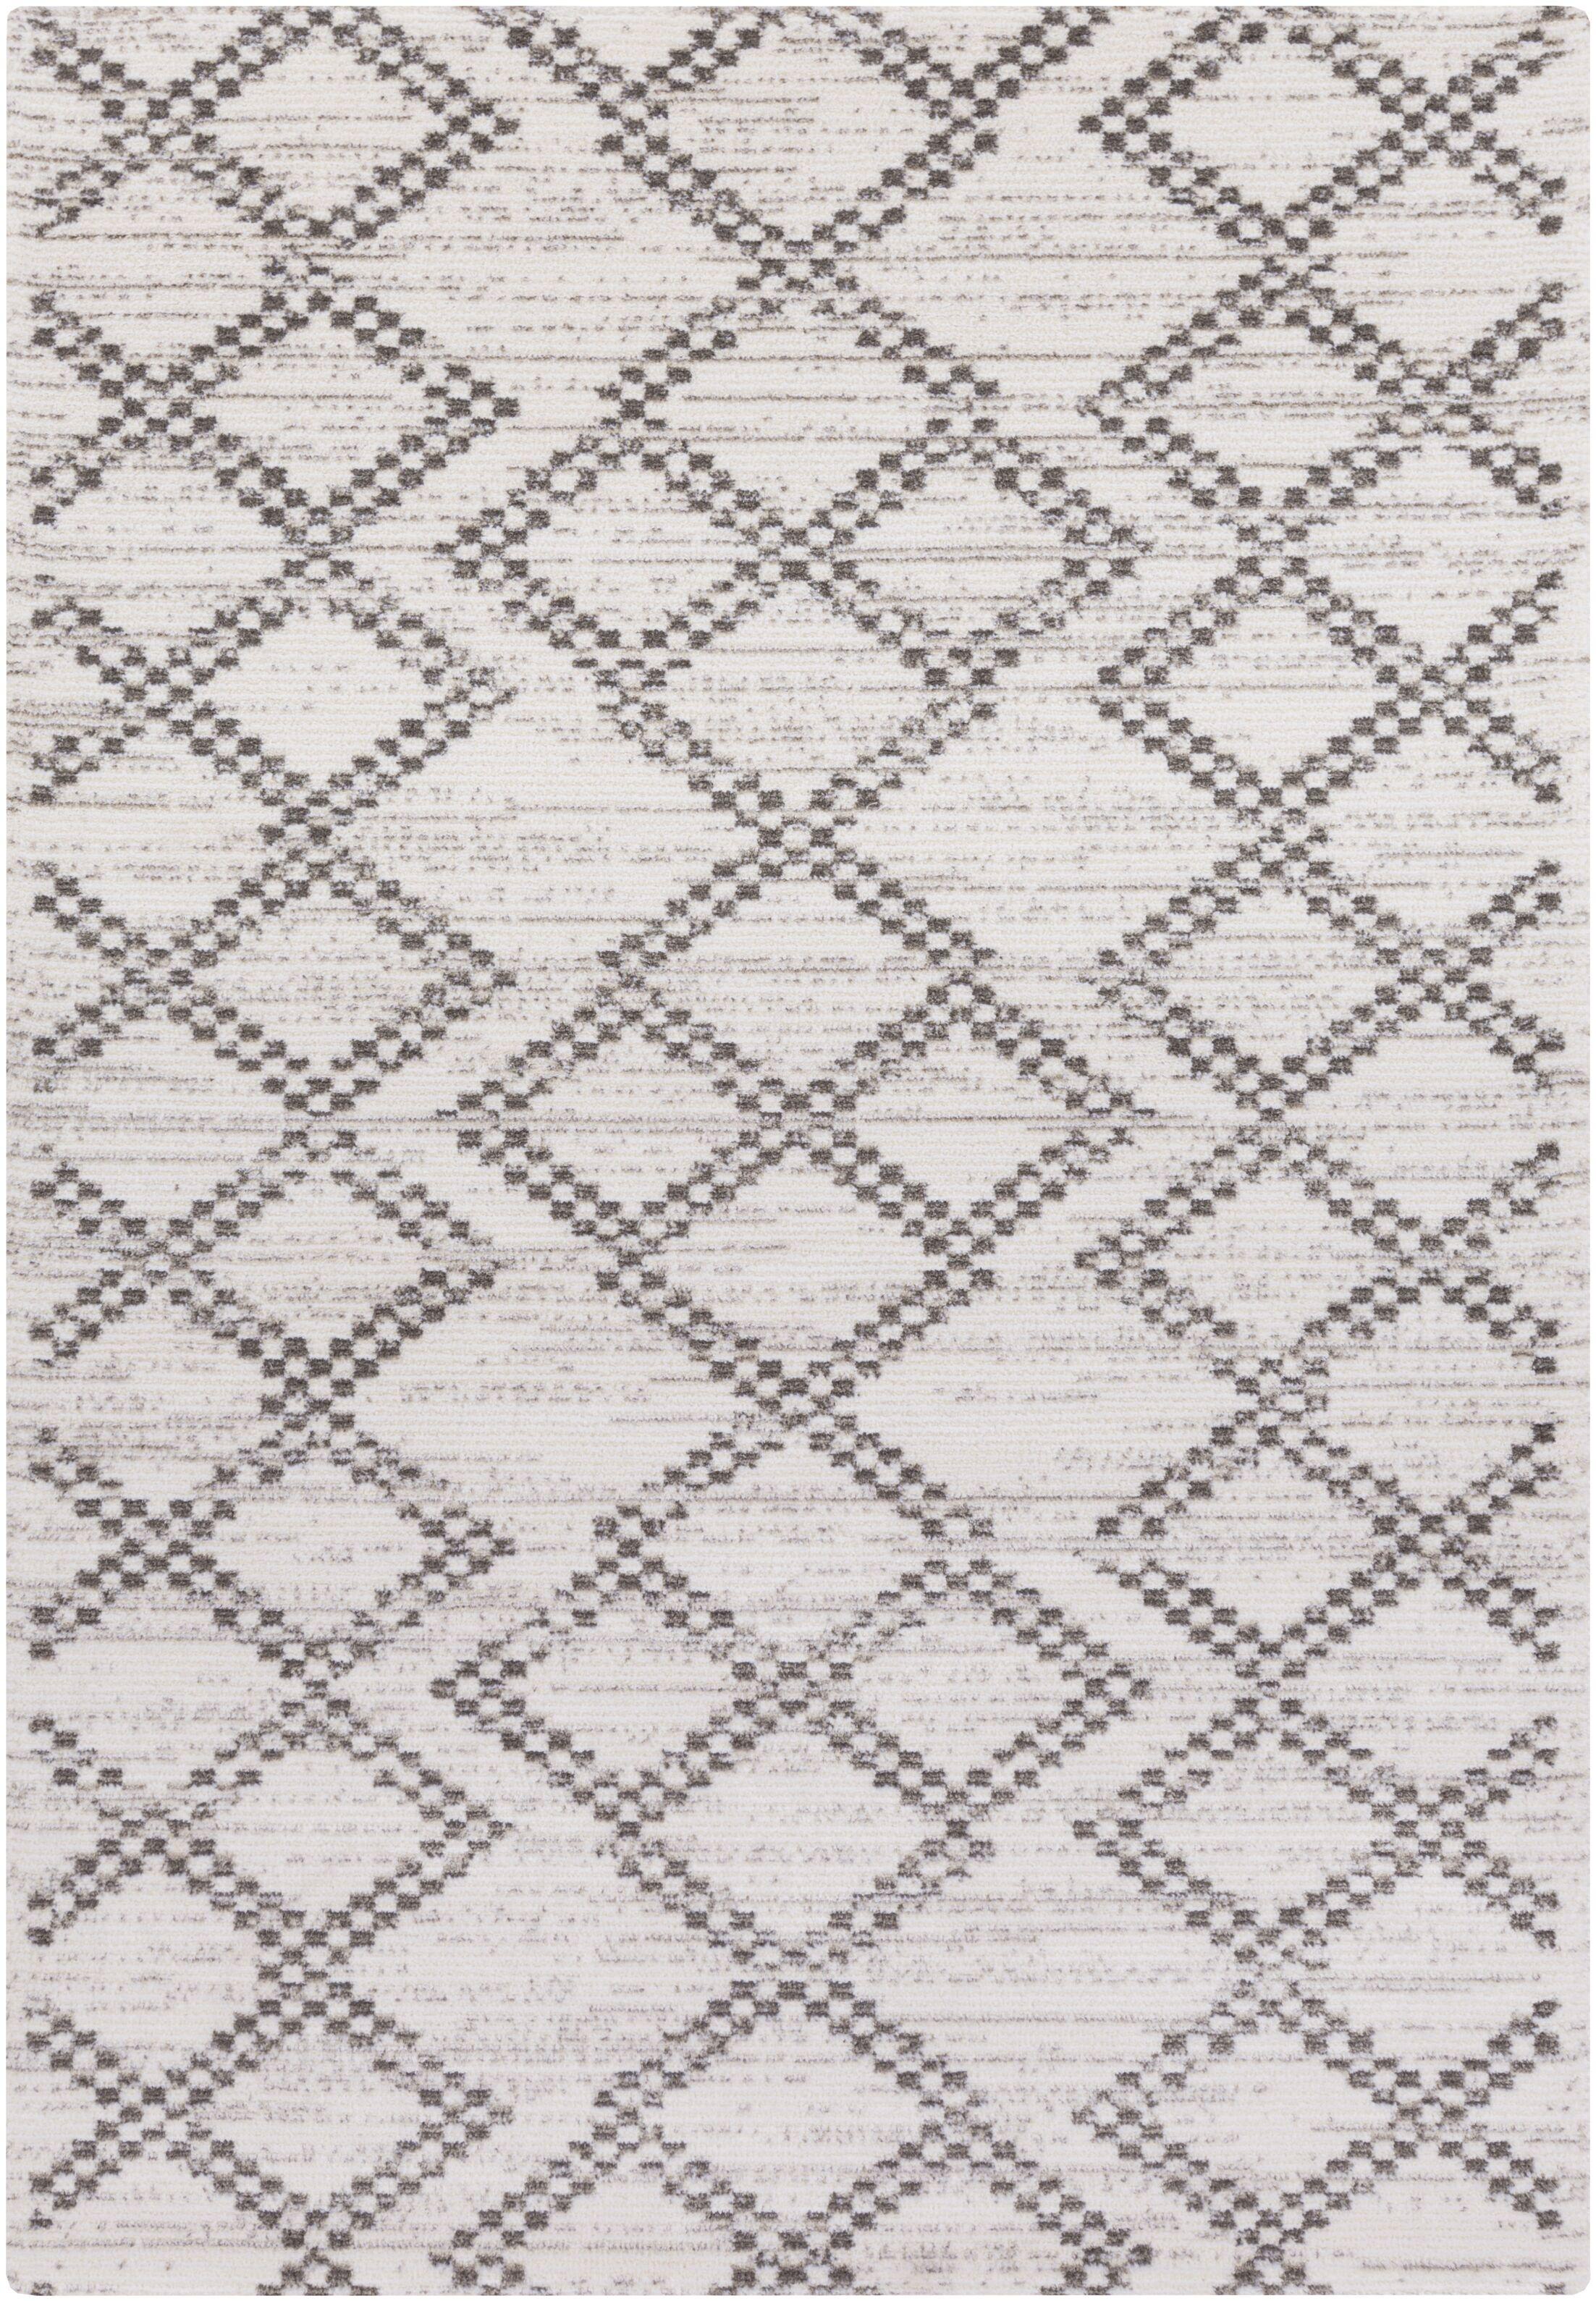 Bremen Ivory/Charcoal Area Rug Rug Size: Rectangle 2' x 3'